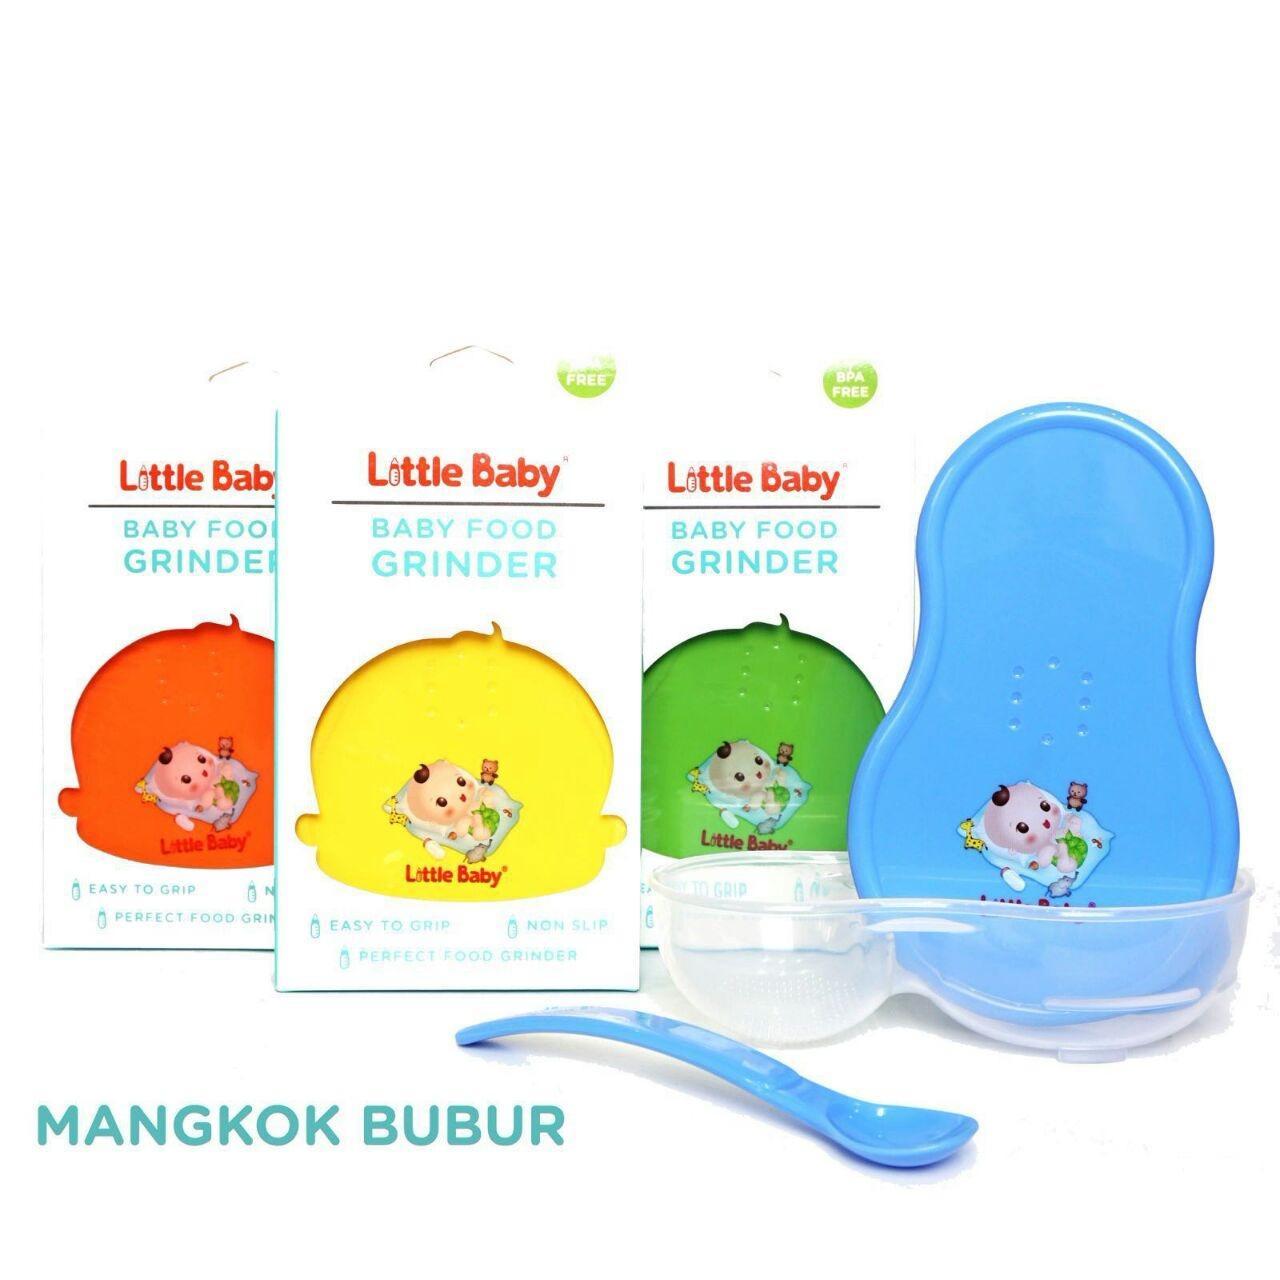 harga Little Baby Food Grinder/ Mangkok Bubur Bayi Tipe 1206 Lazada.co.id